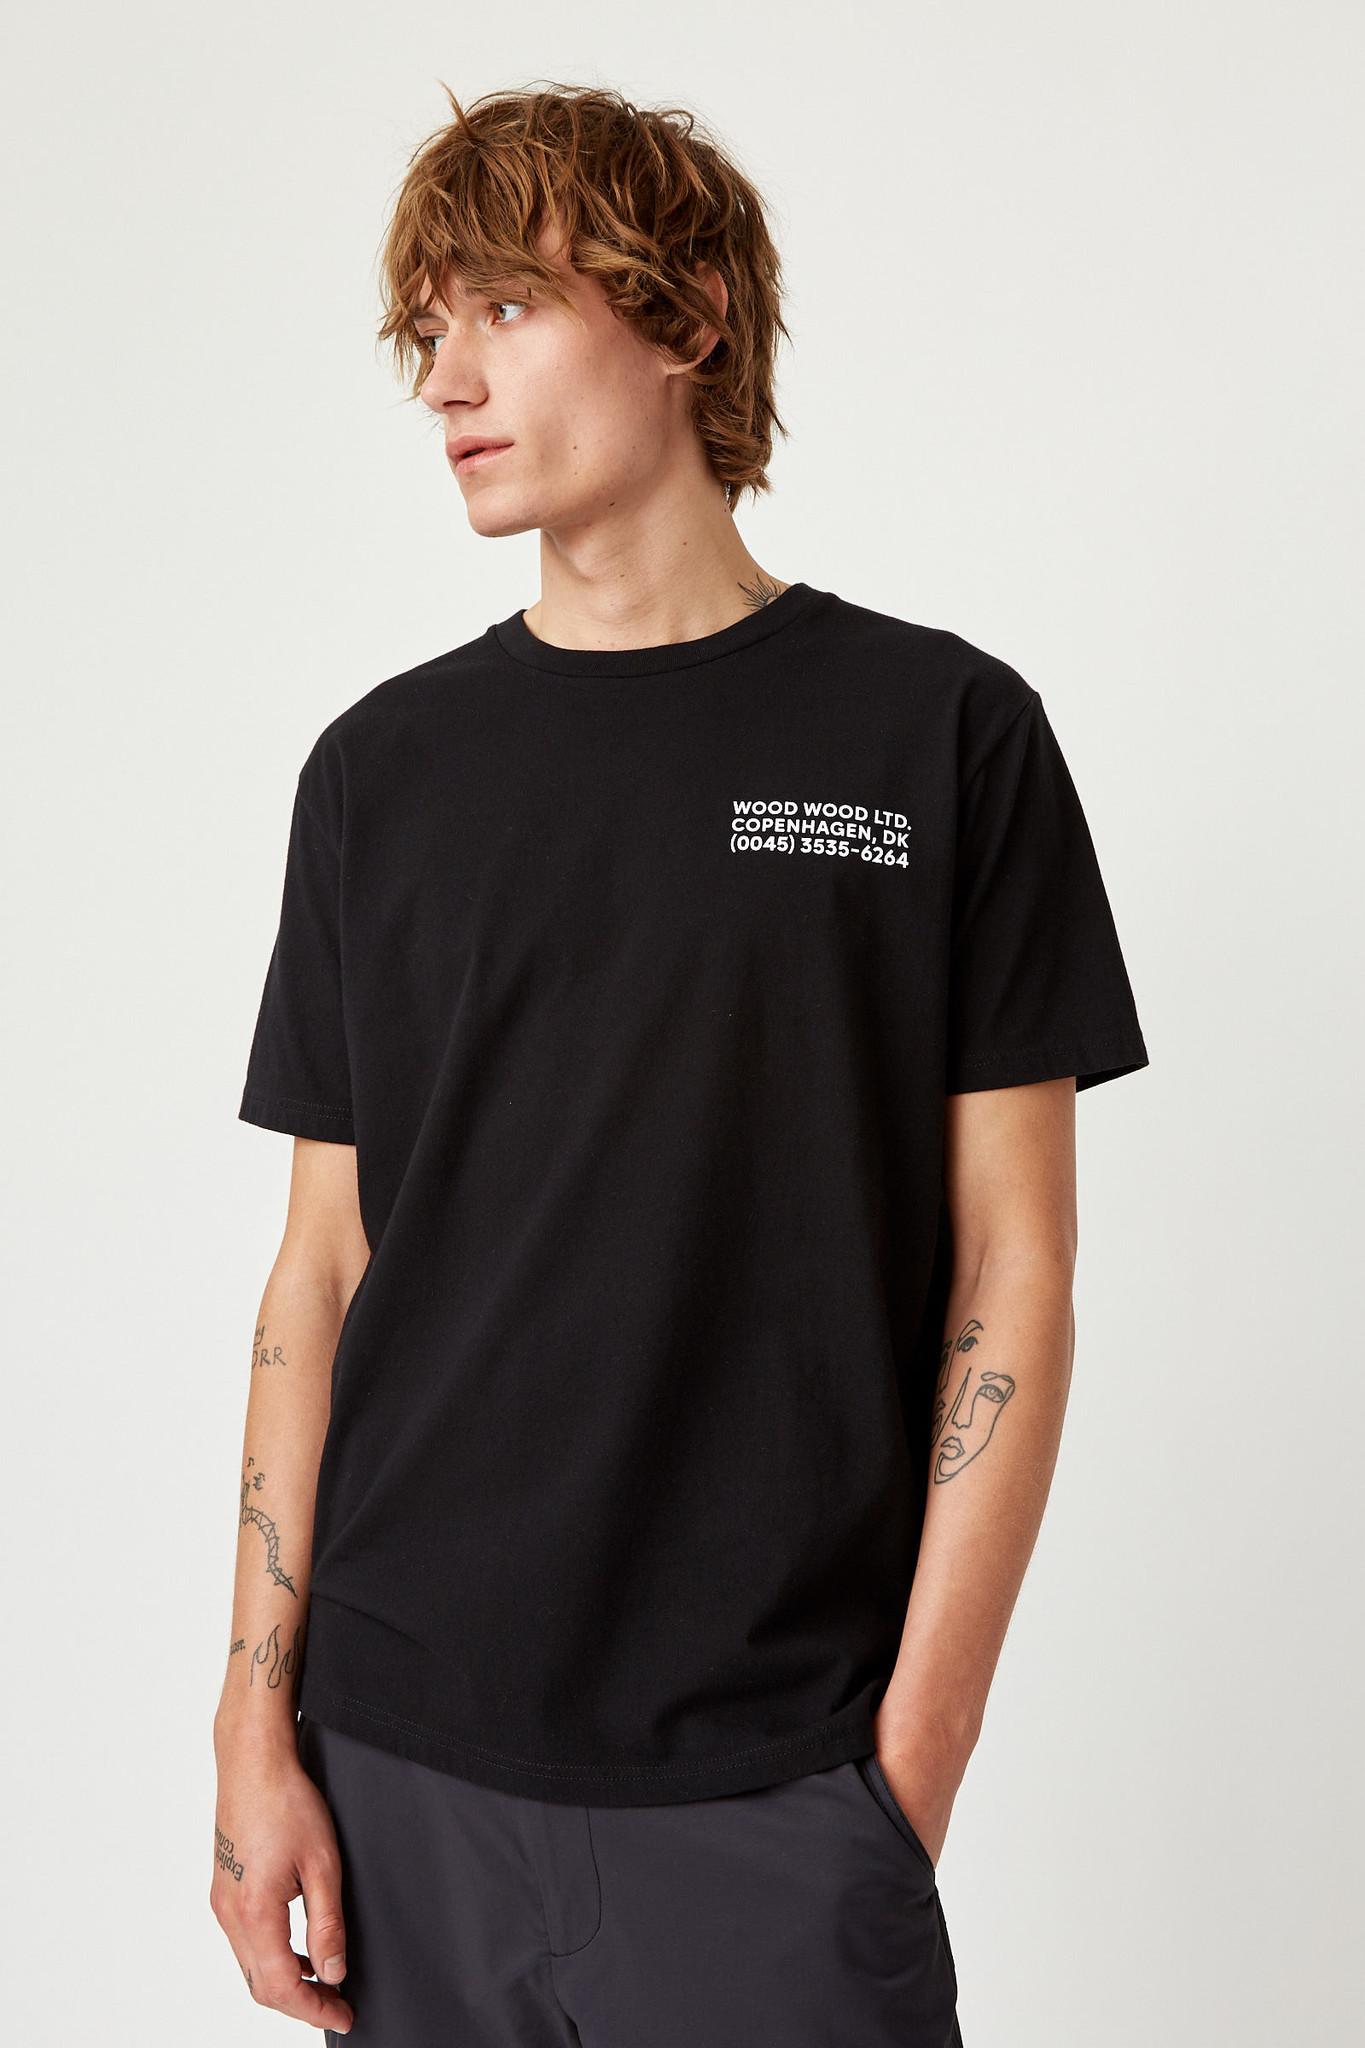 Info T-Shirt Black Unisex-9